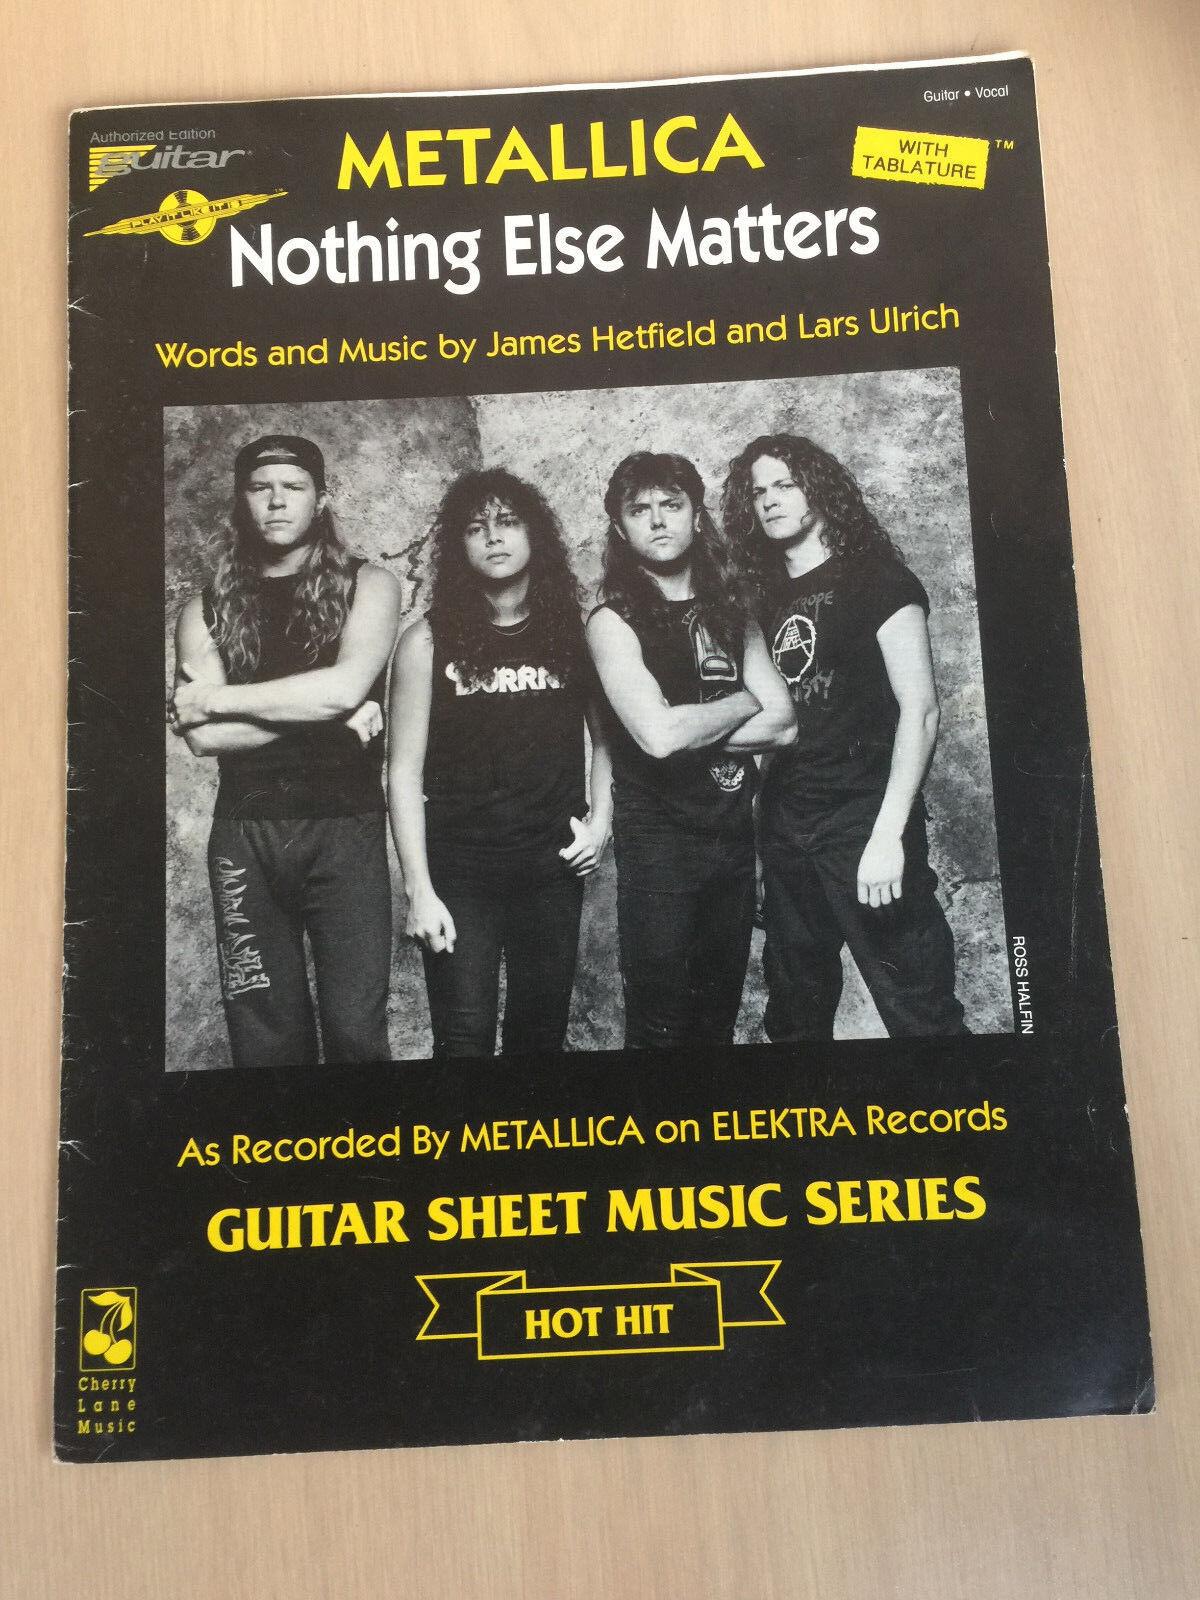 METALLICA rare GUITAR SHEET MUSIC 1991 tablature NOTHING ELSE MATTERS  lars